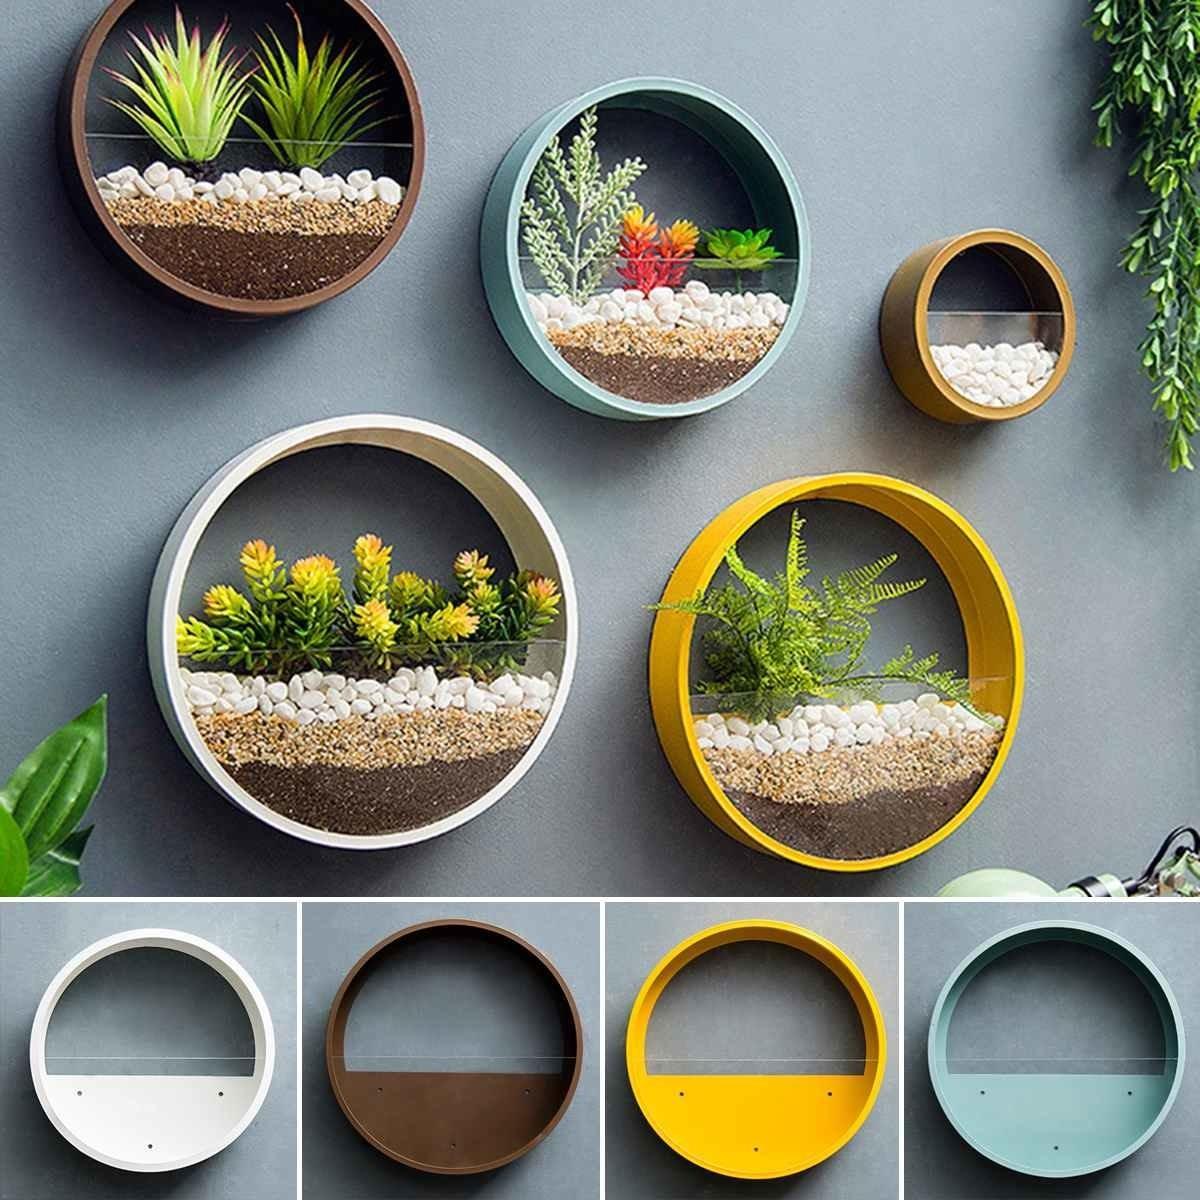 Modern Round Iron Wall Vase Home Living Room Restaurant Hanging Flower Pot Wall Decor Succulent Plant Planters Art Glass Vases CJ191226